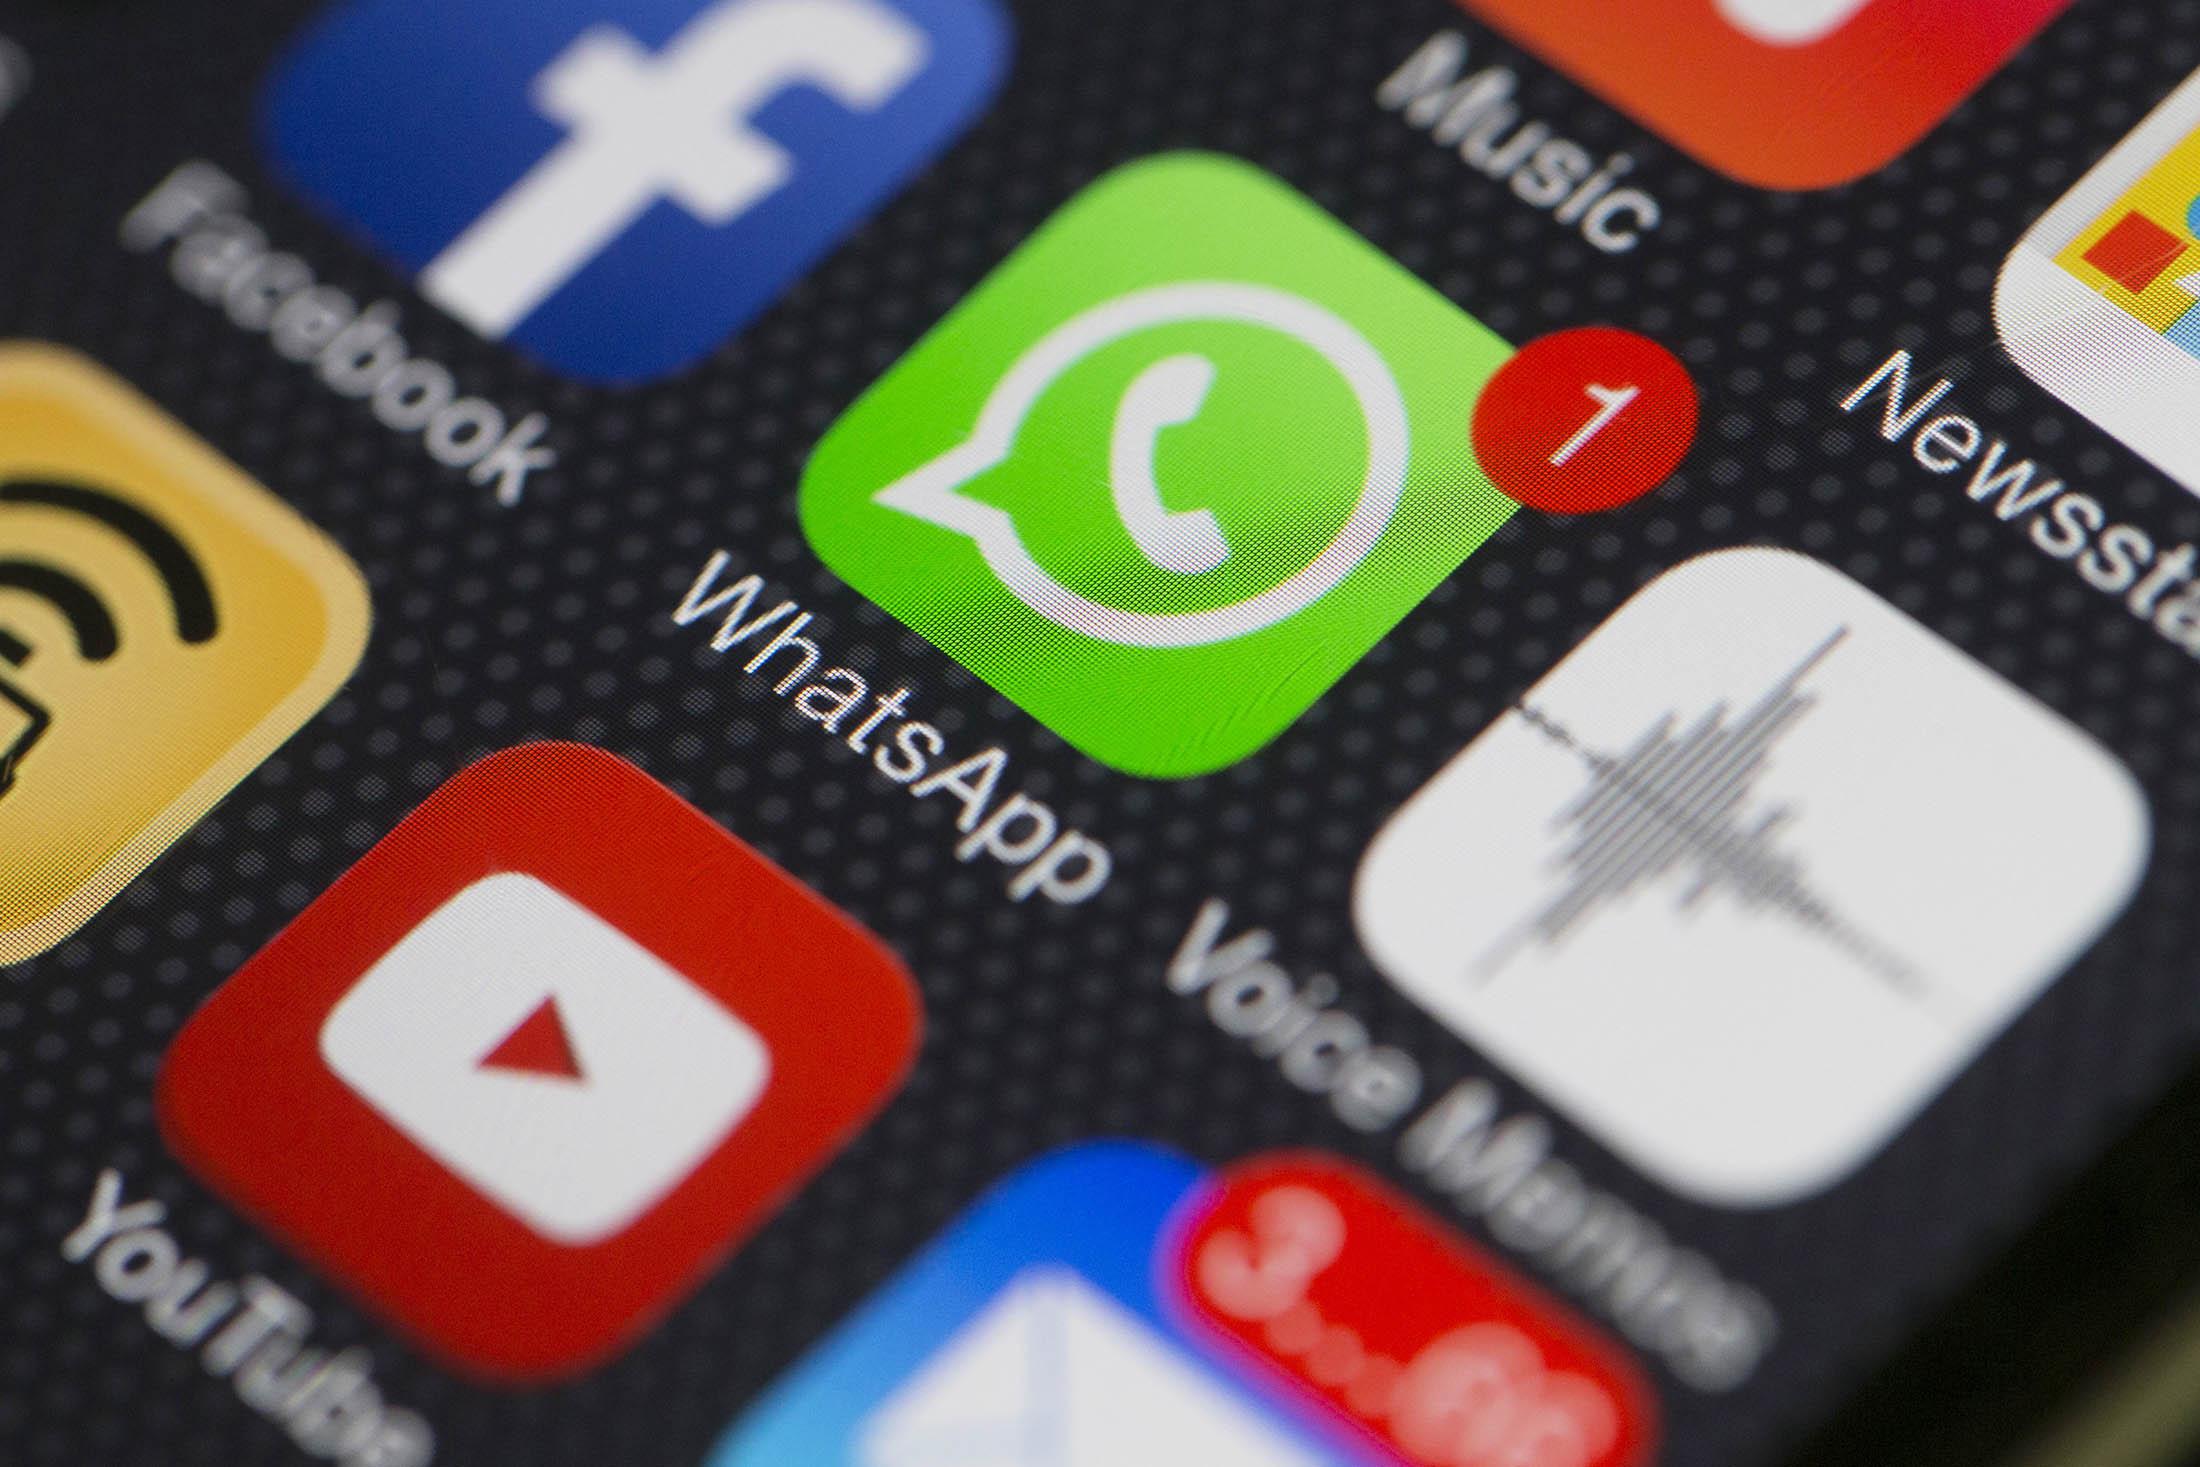 China Blocks WhatsApp in Latest App Crackdown: NYT